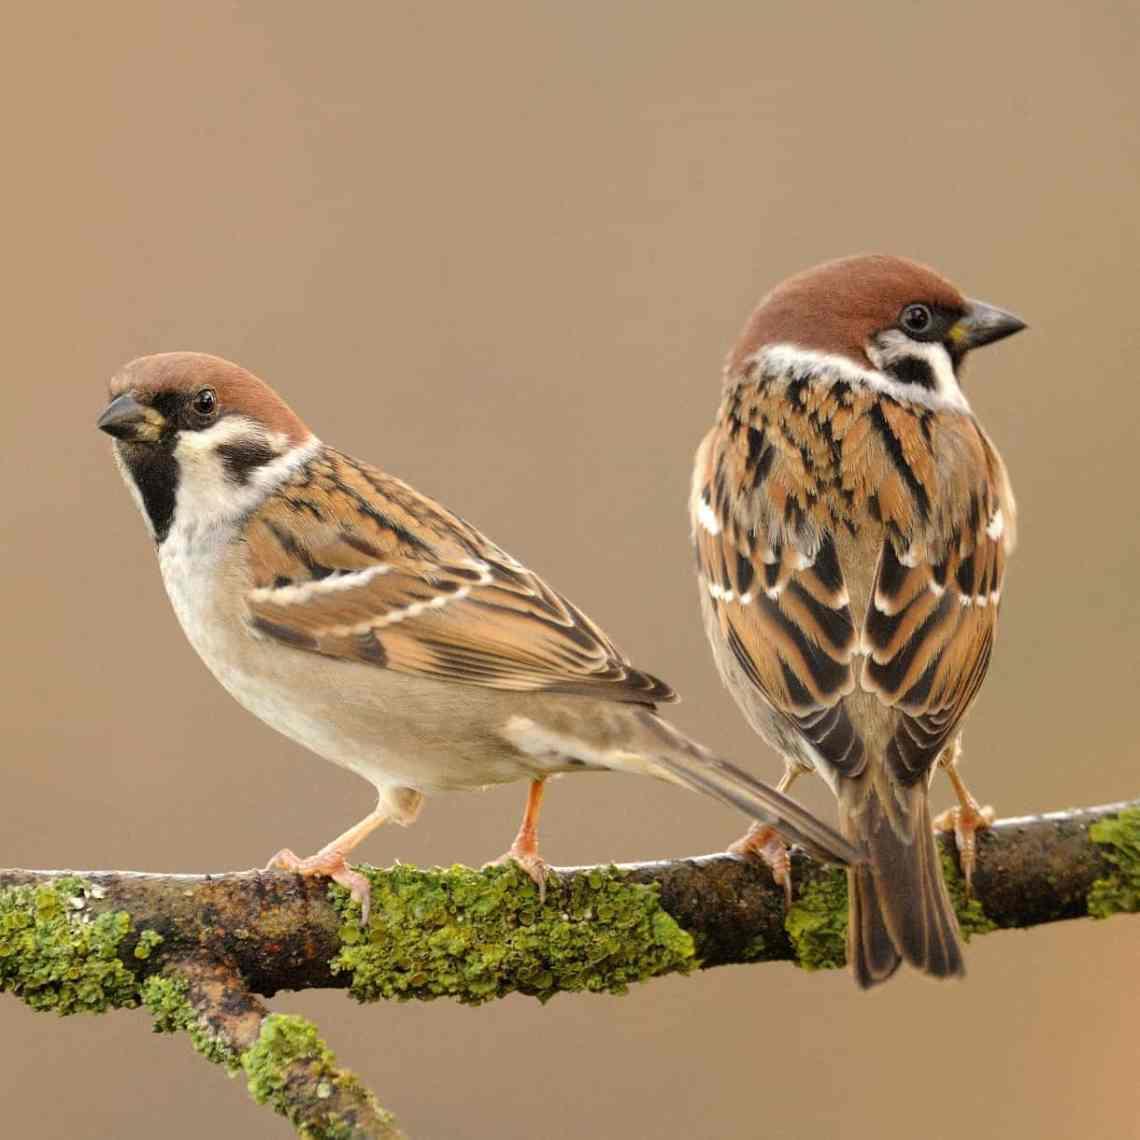 Tree_sparrow.jpg